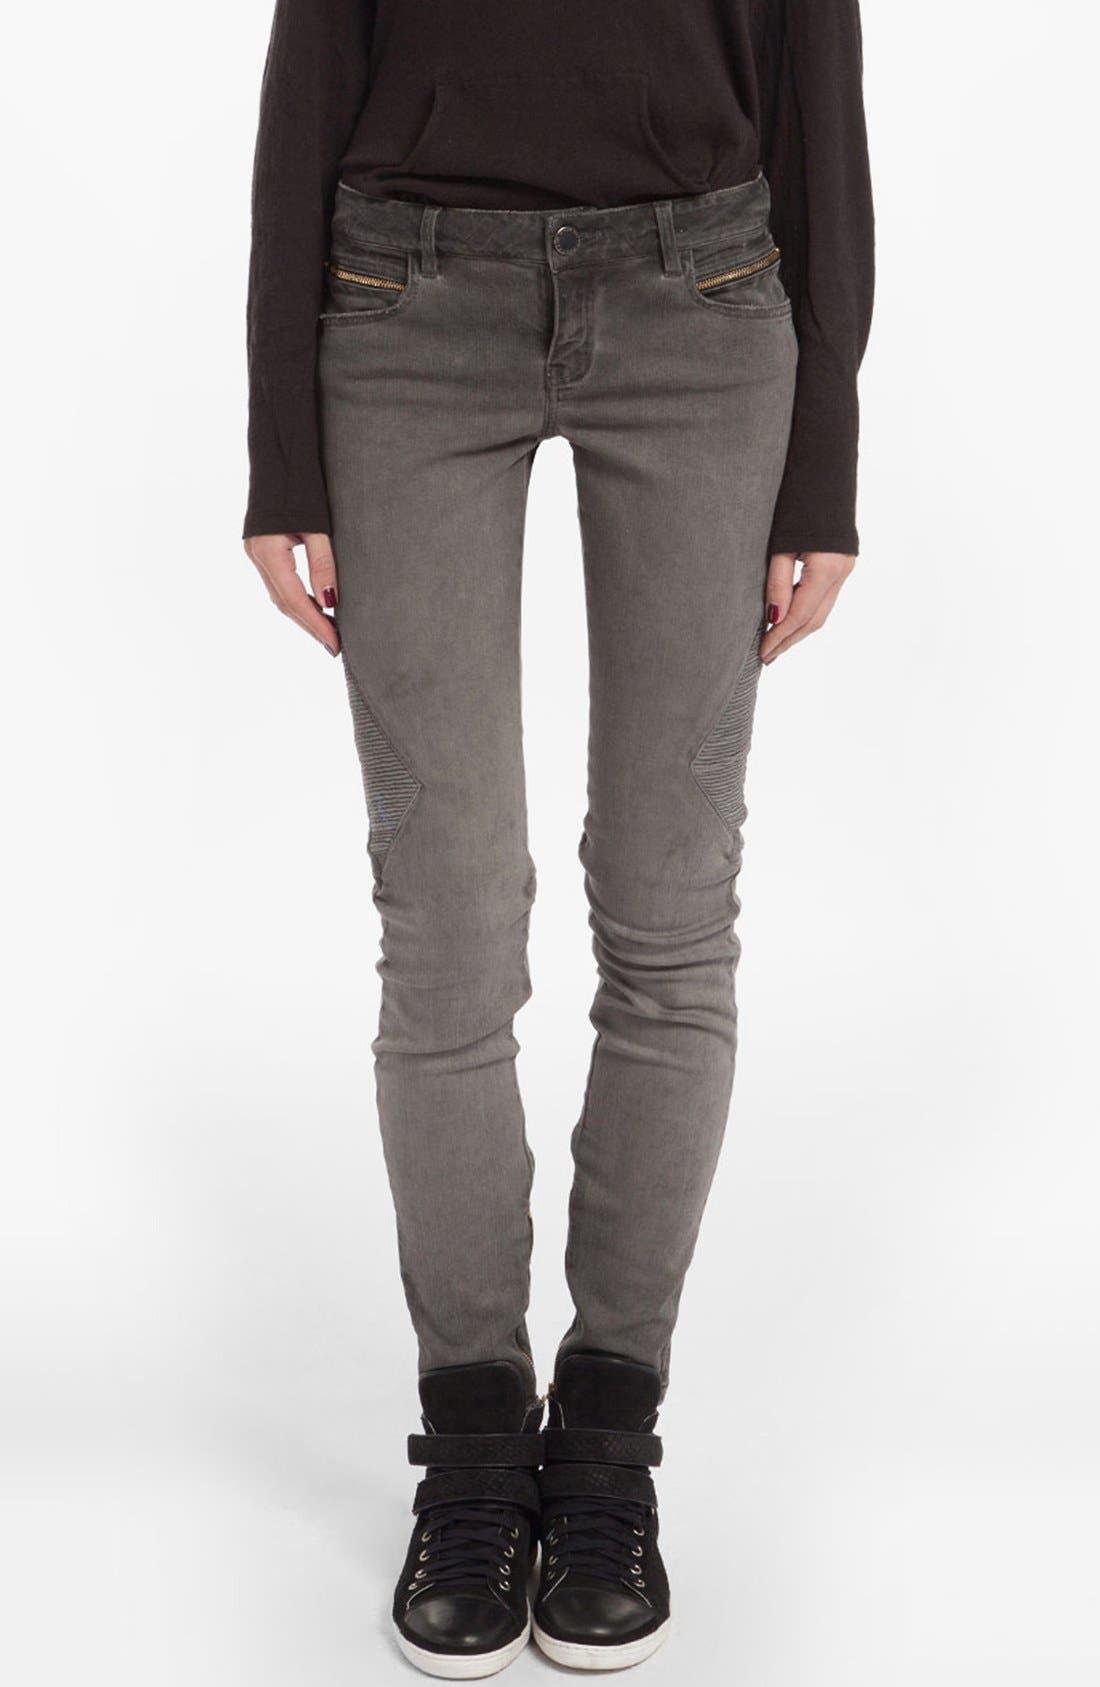 Main Image - maje 'Diabolo' Skinny Jeans (Charcoal Grey)